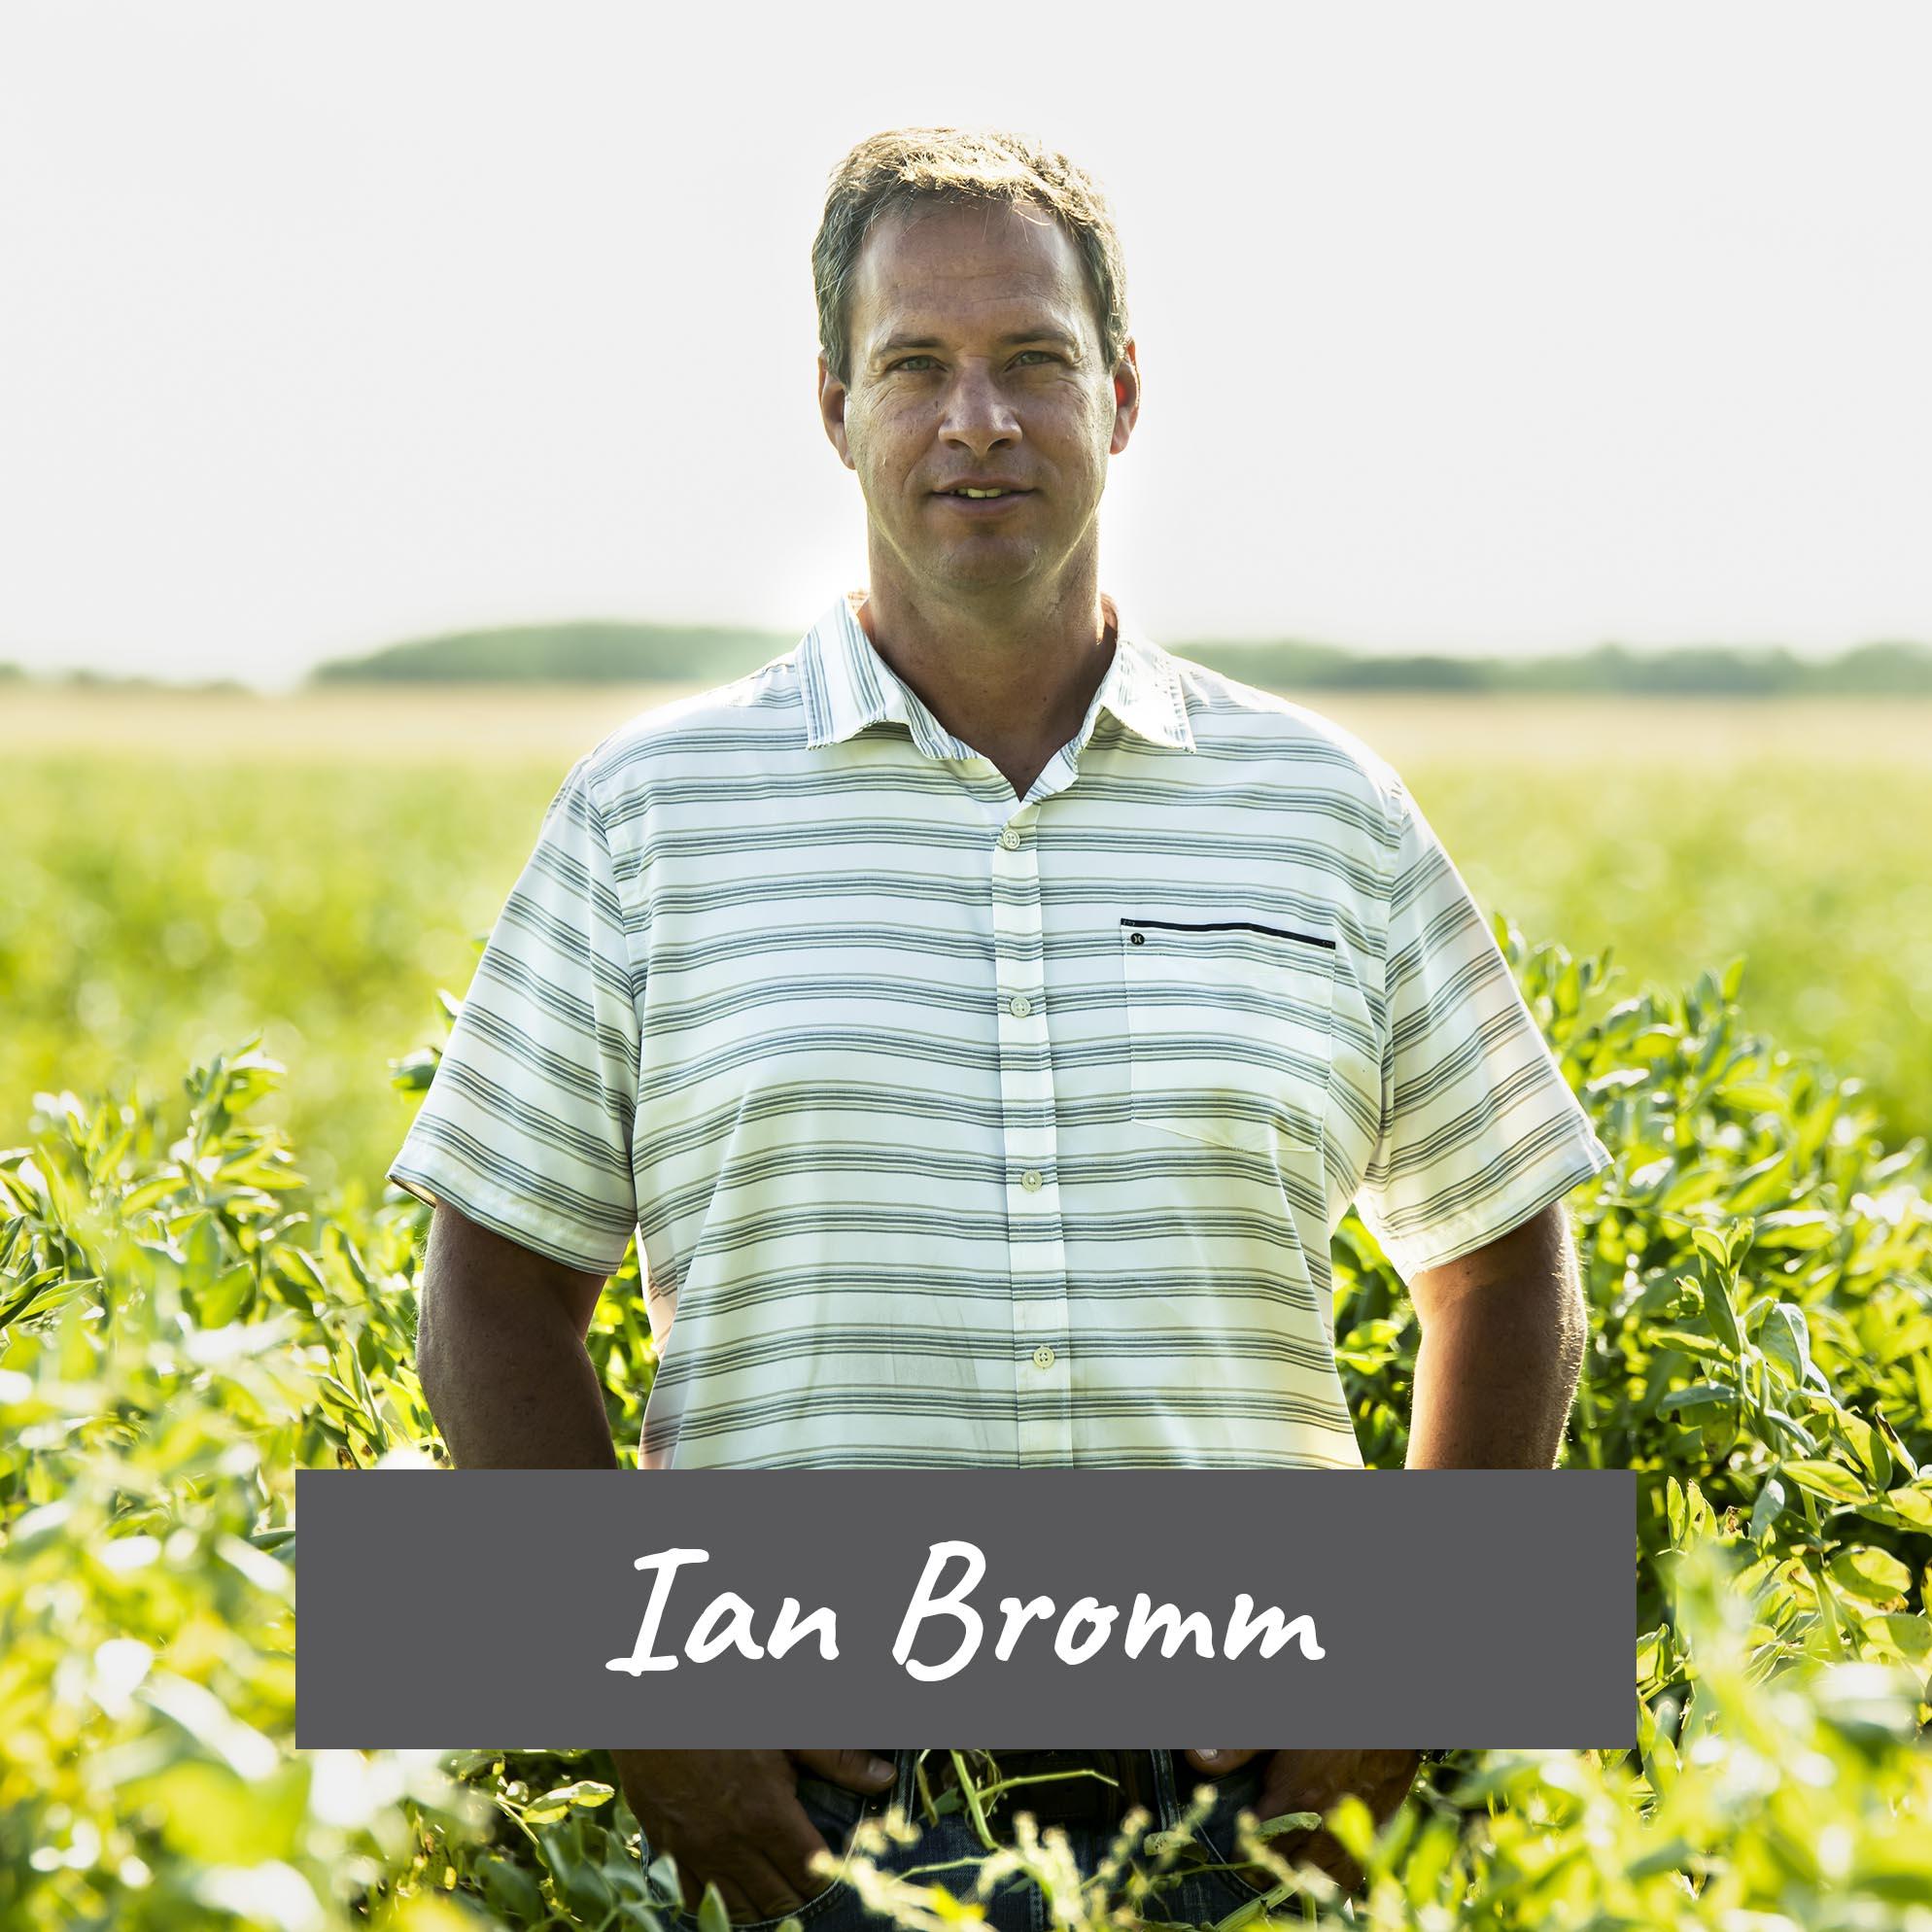 Ian Bromm